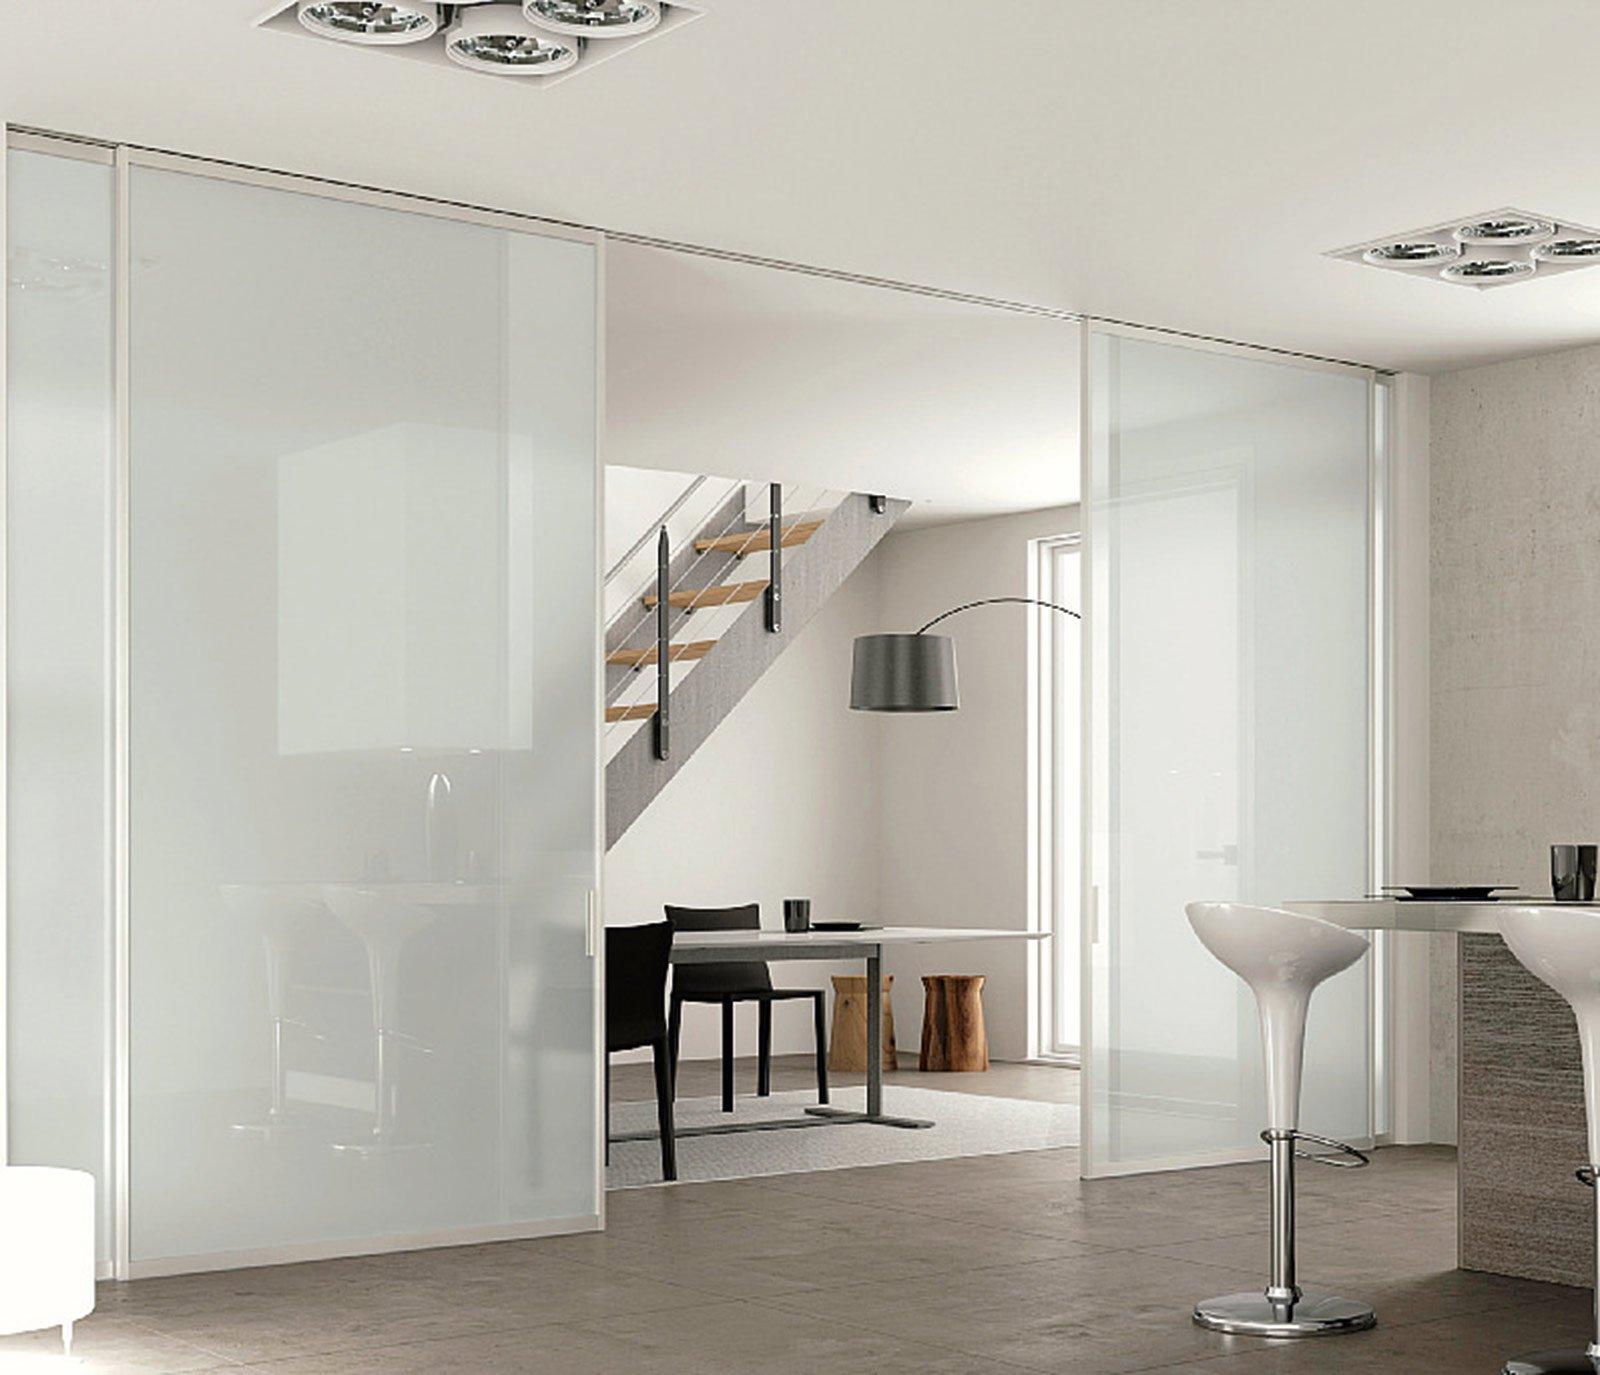 Una cucina parzialmente schermata cose di casa - Misure porta finestra ...